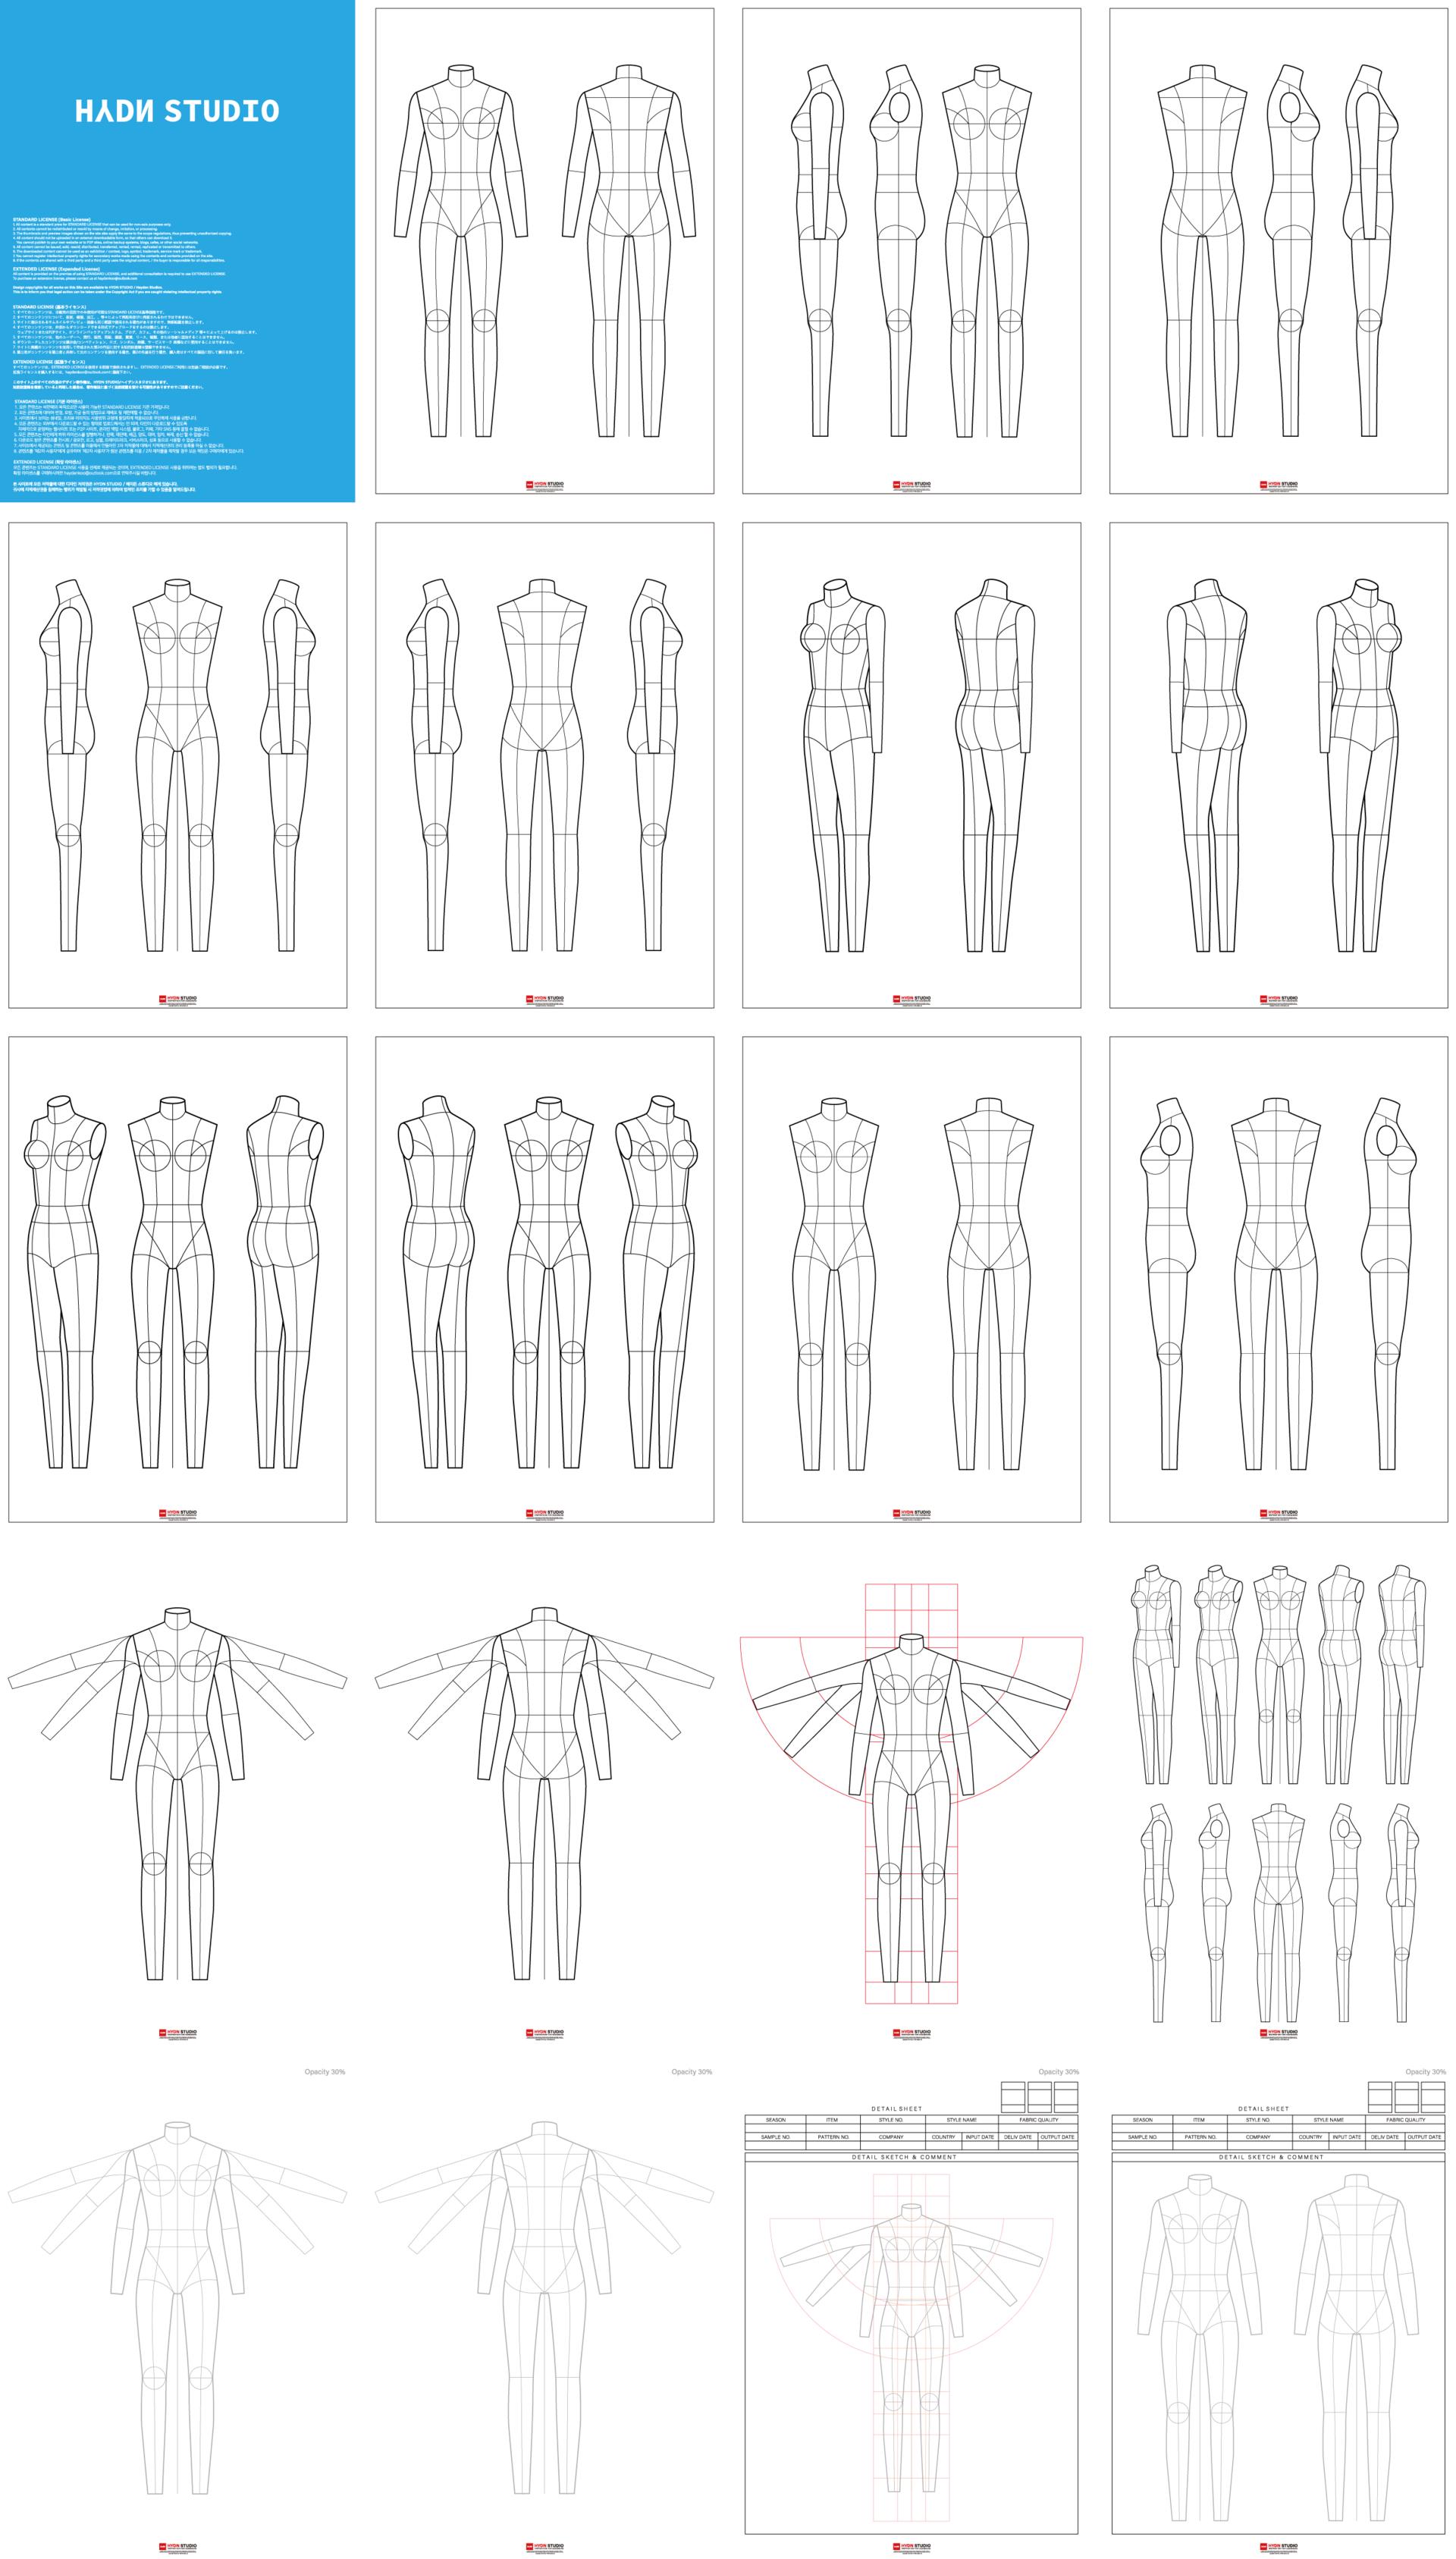 Fashion Flats Body Templates Women For Fashion Illustration Fashion Flats Fashion Illustration Fashion Template Hydnstudio Fashion Design